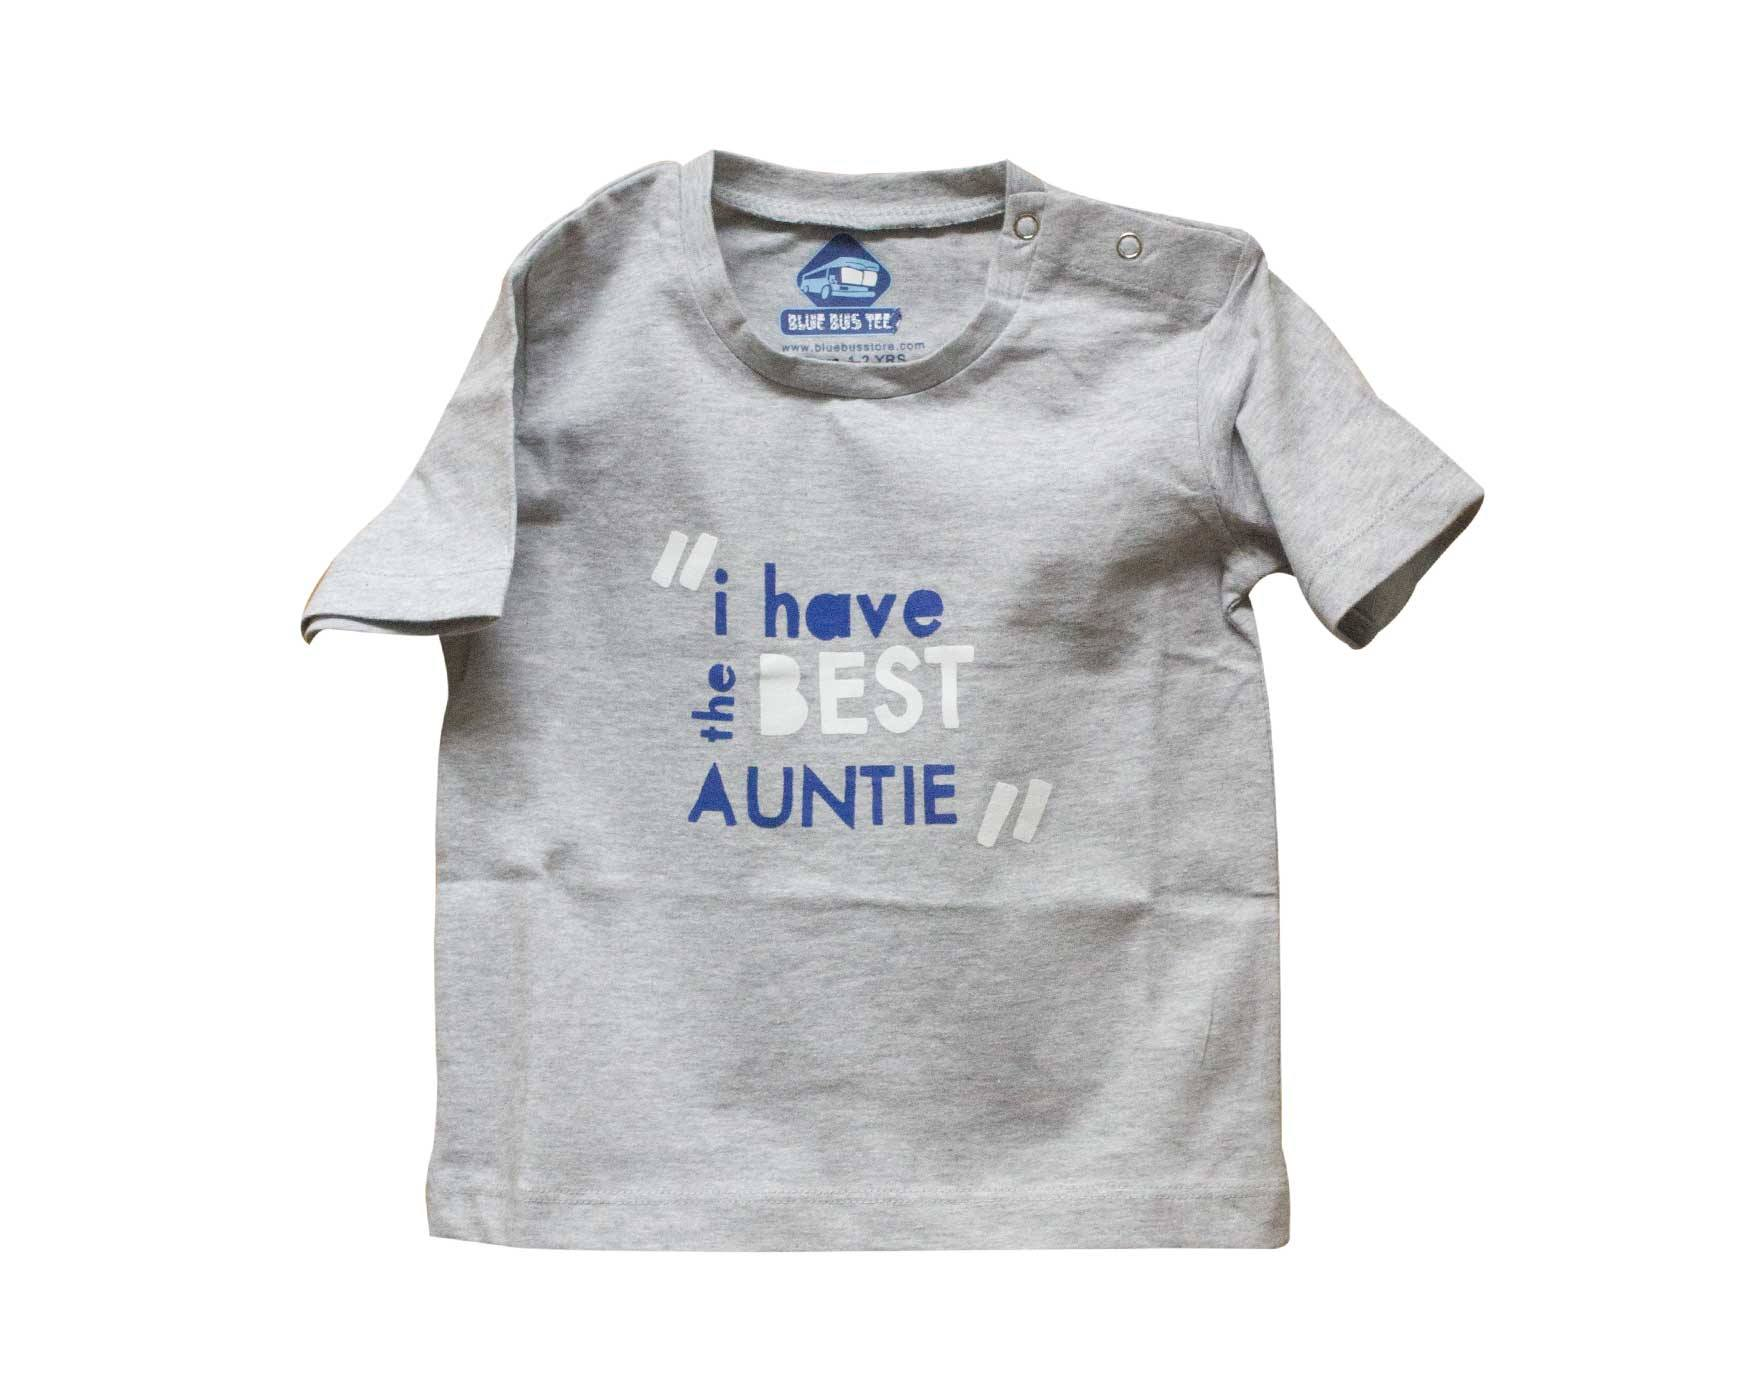 Kids t shirt online store buy best aunty t shirt for for Best place to buy t shirts online